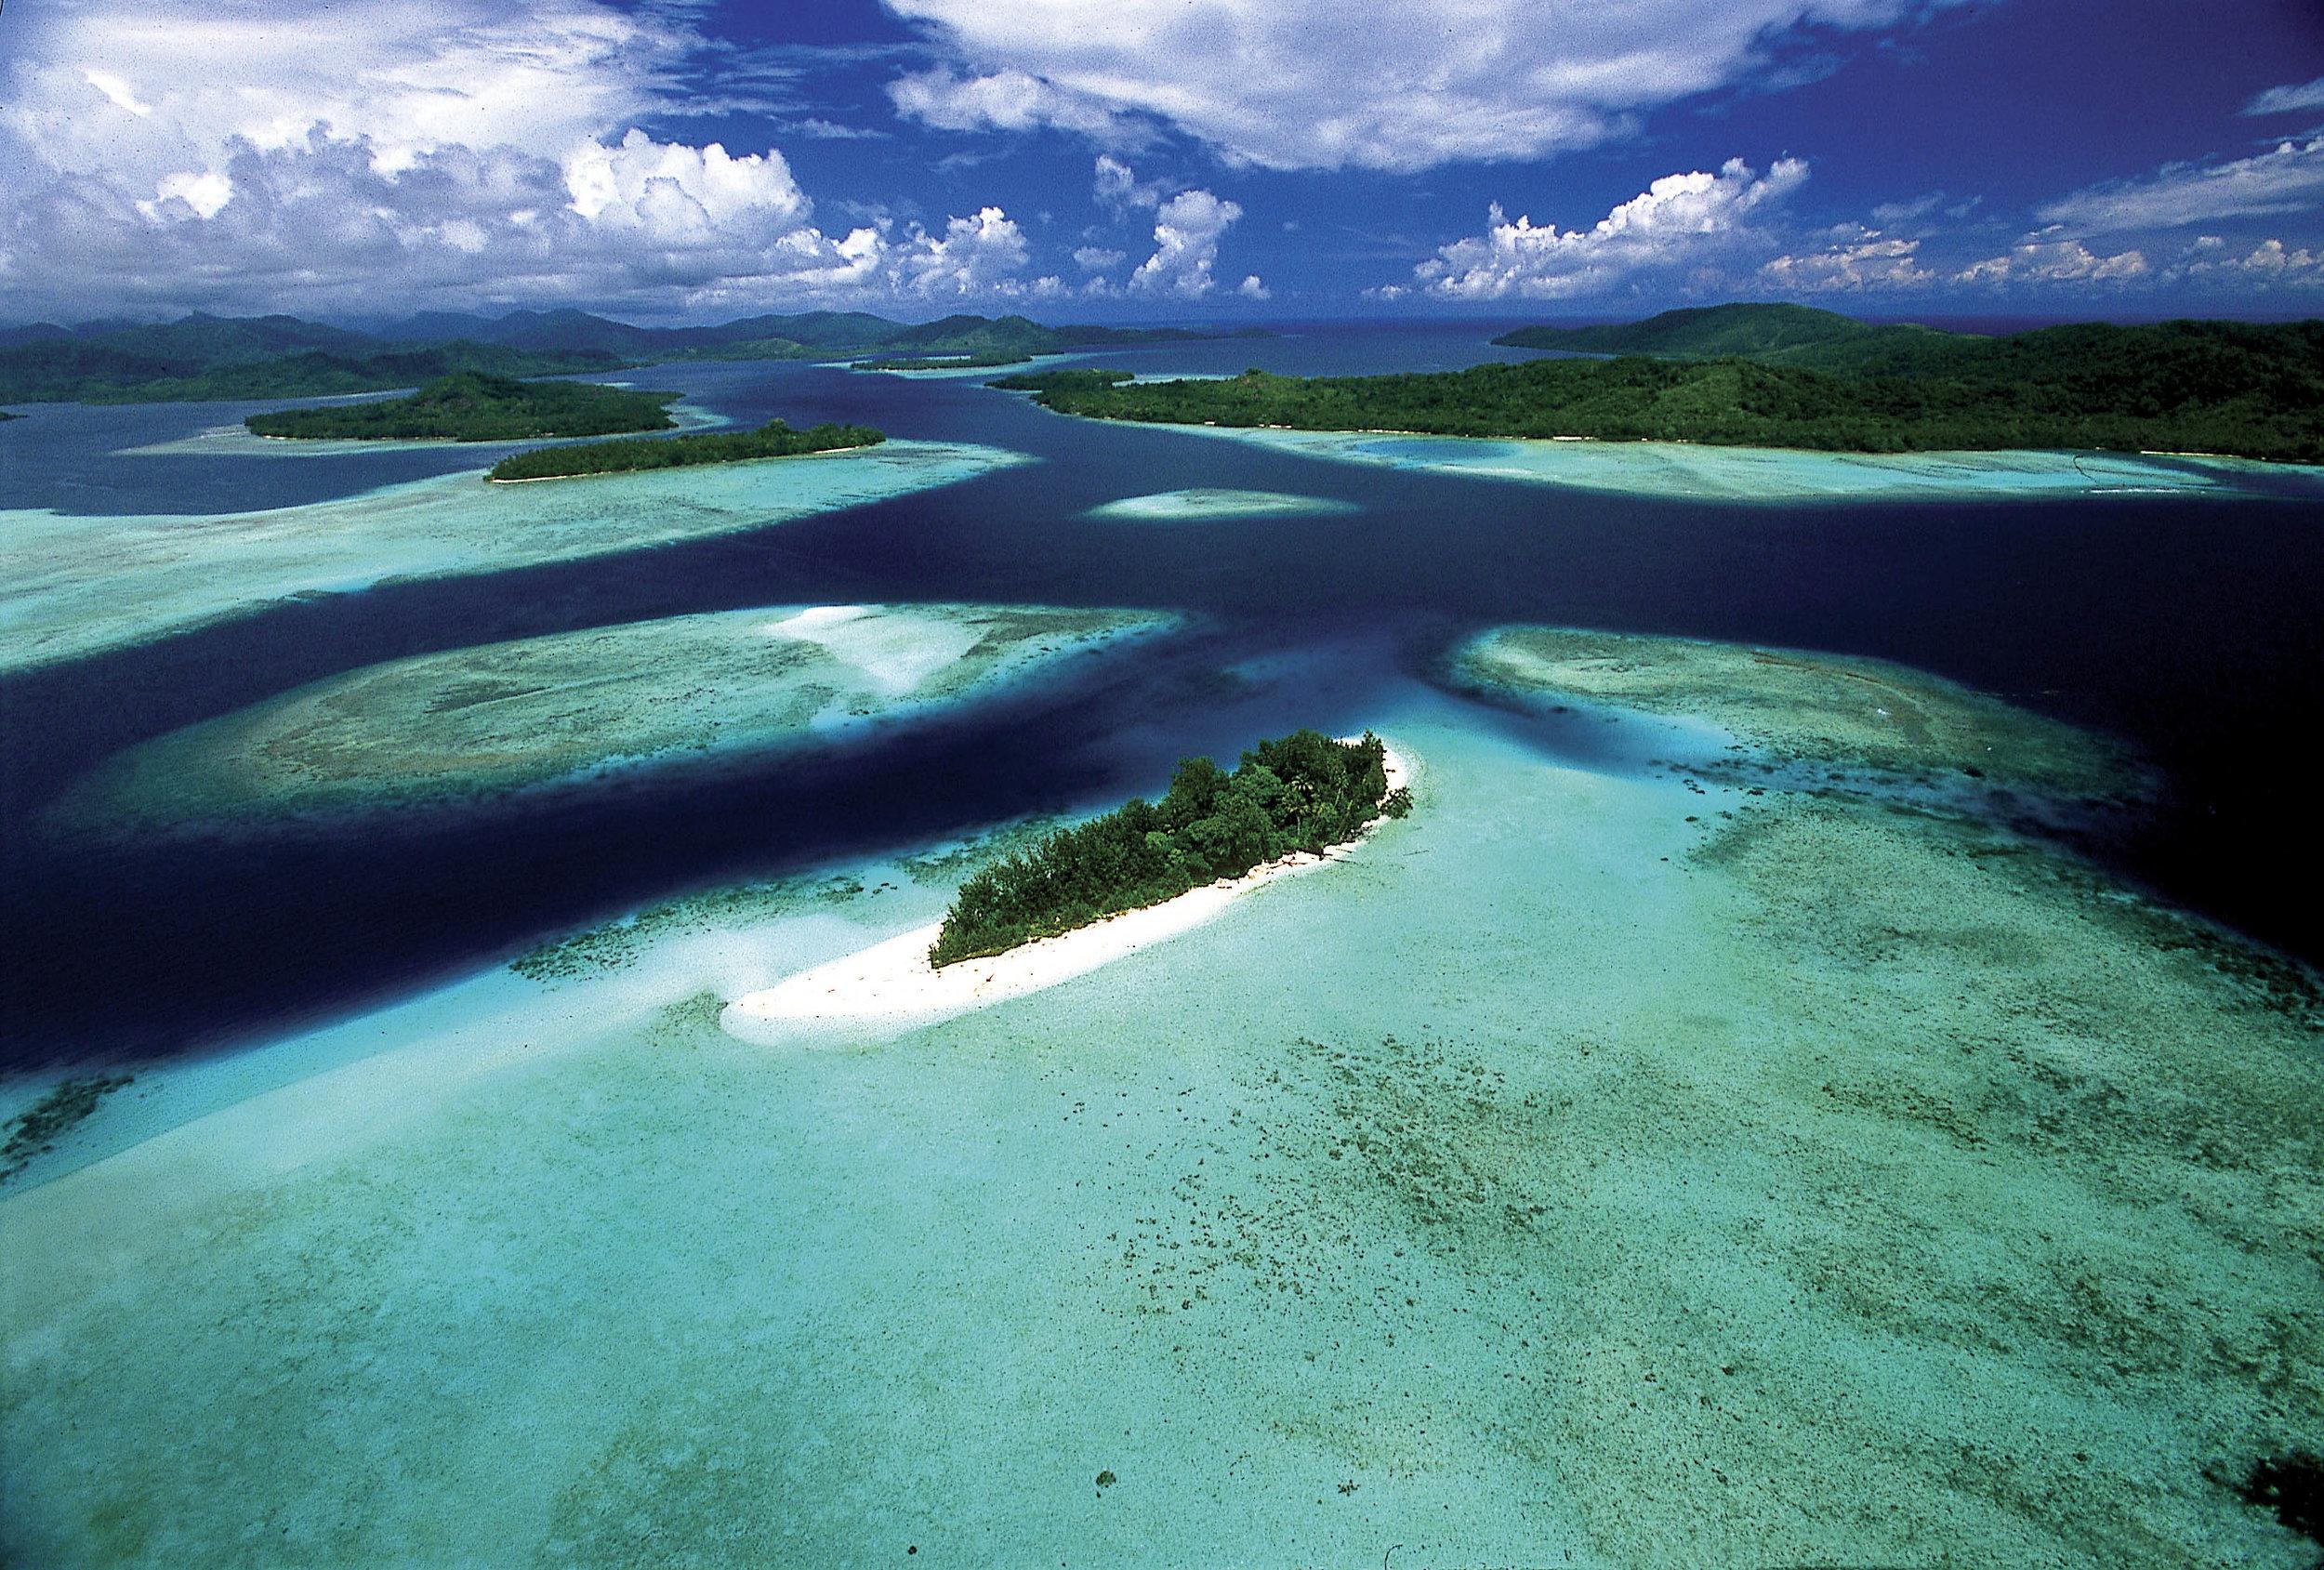 Solomon Islands (image care of the Solomon Islands Visitors' Bureau).